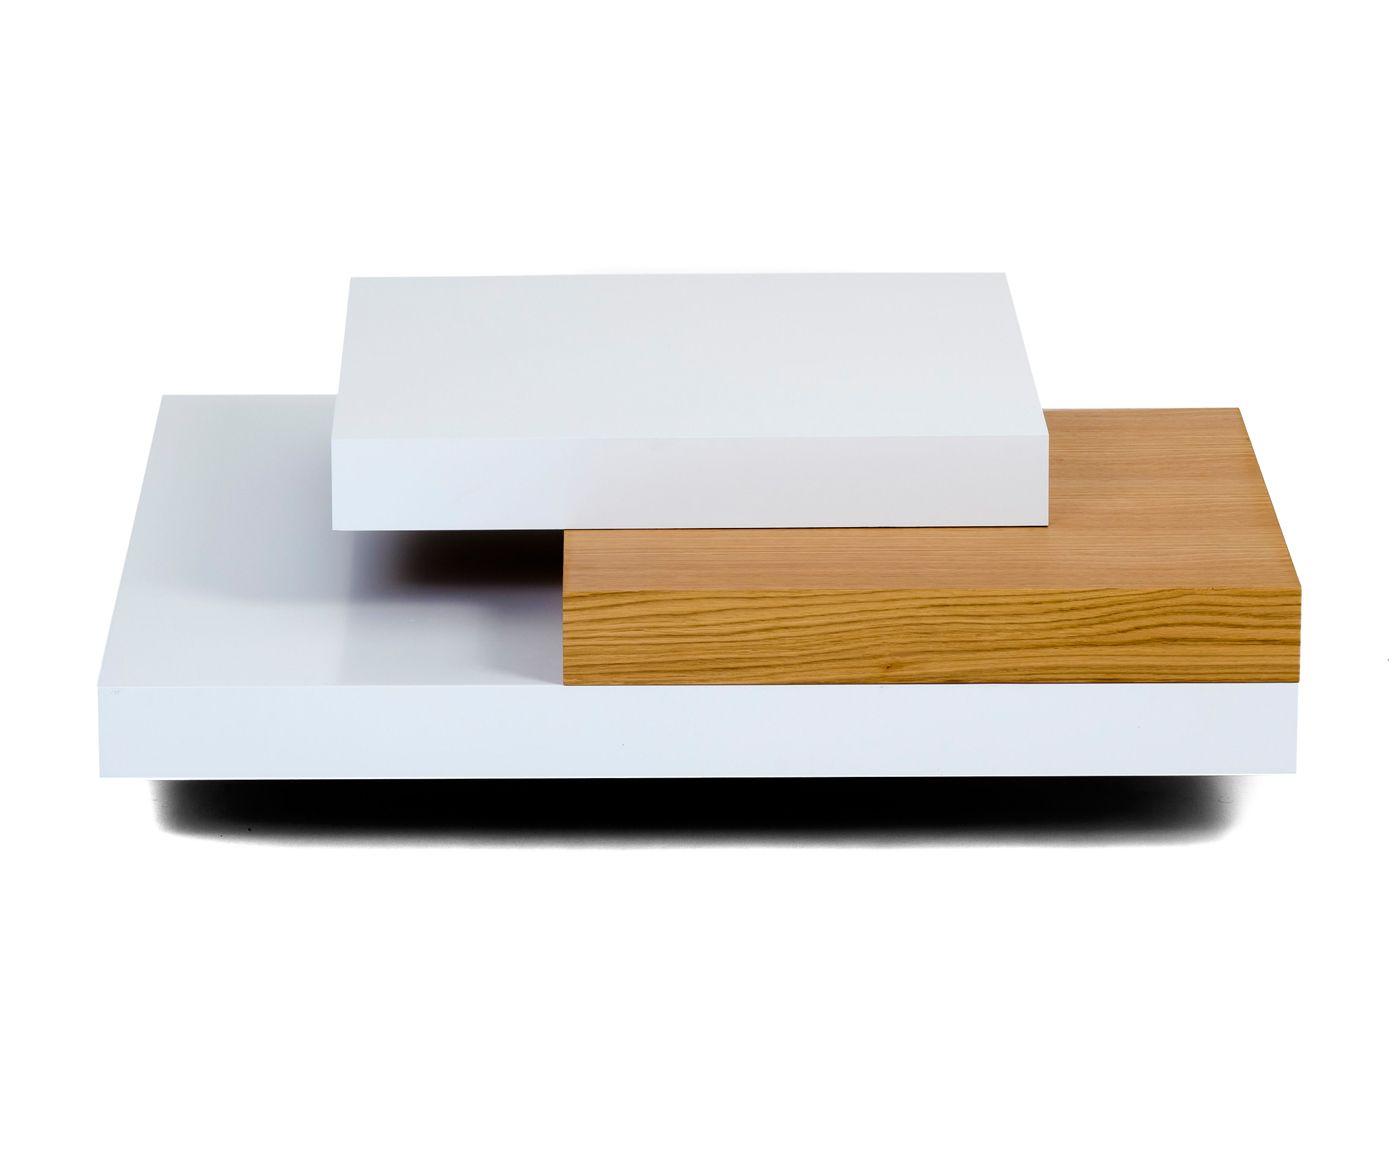 Couchtisch Slate, Eiche/weiß, B 90 cm | Westwing Home & Living